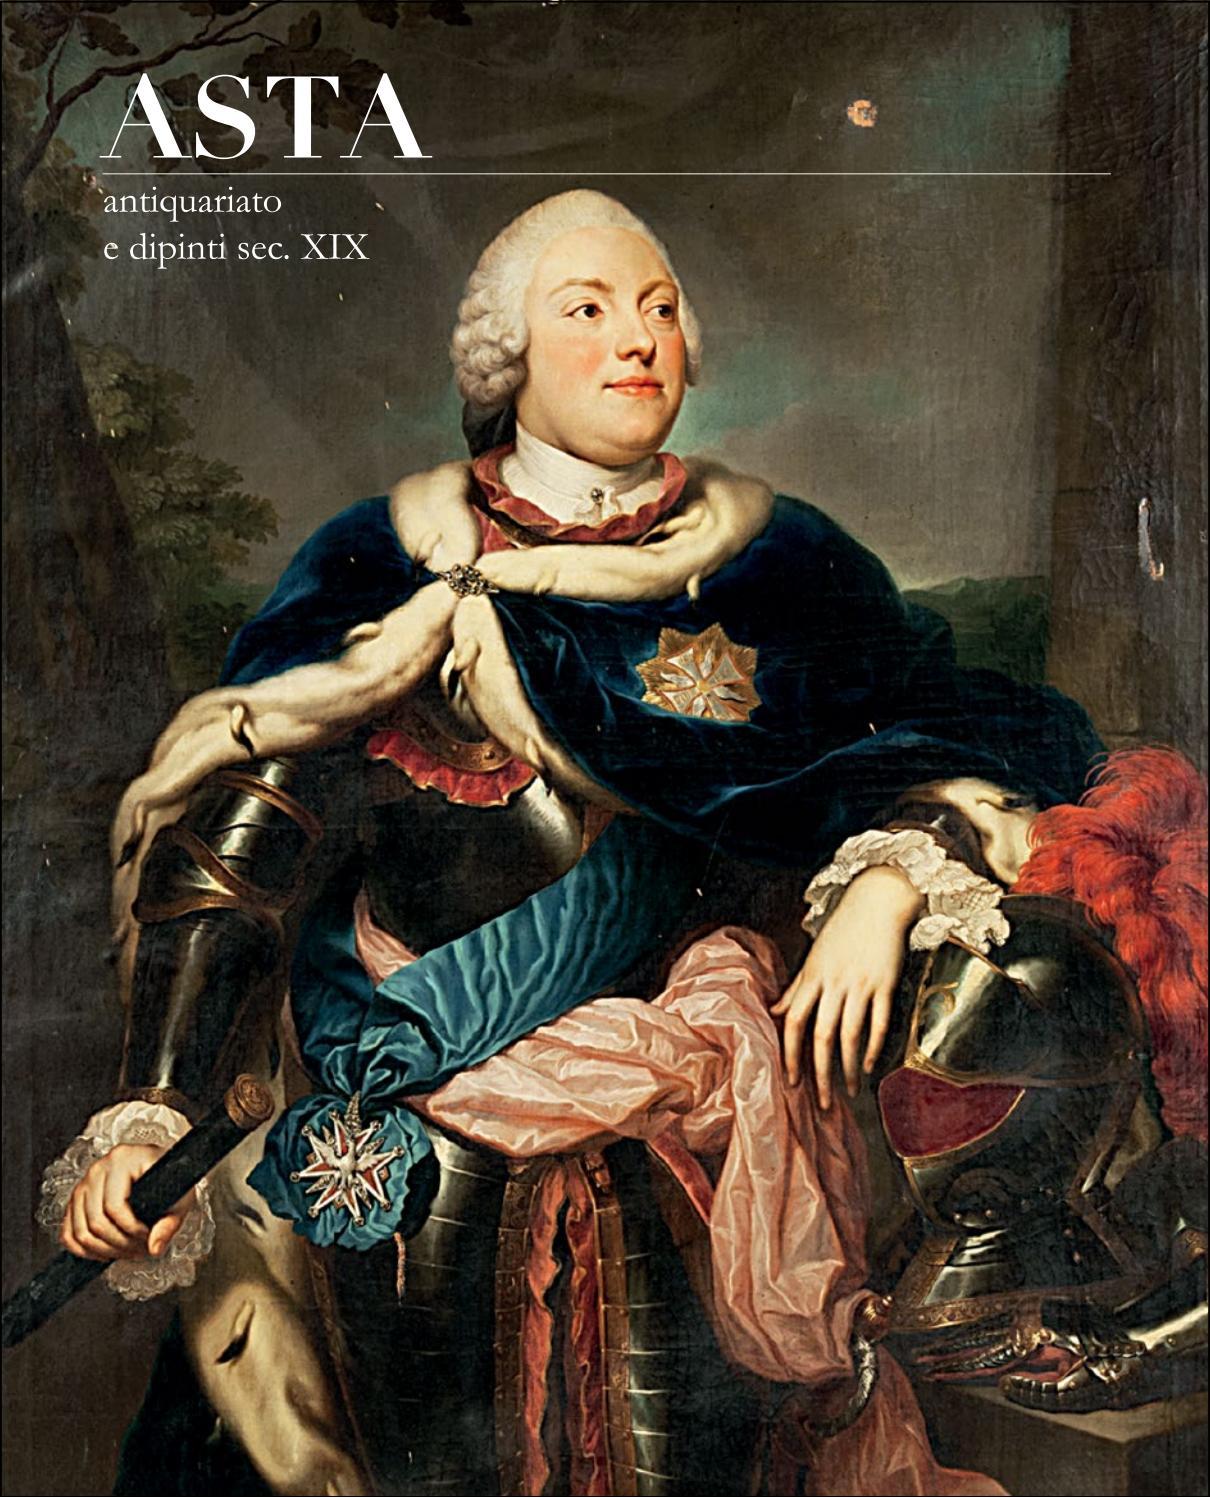 Catalogo d'Asta 6 dicembre 2012 by Aste Deals - issuu